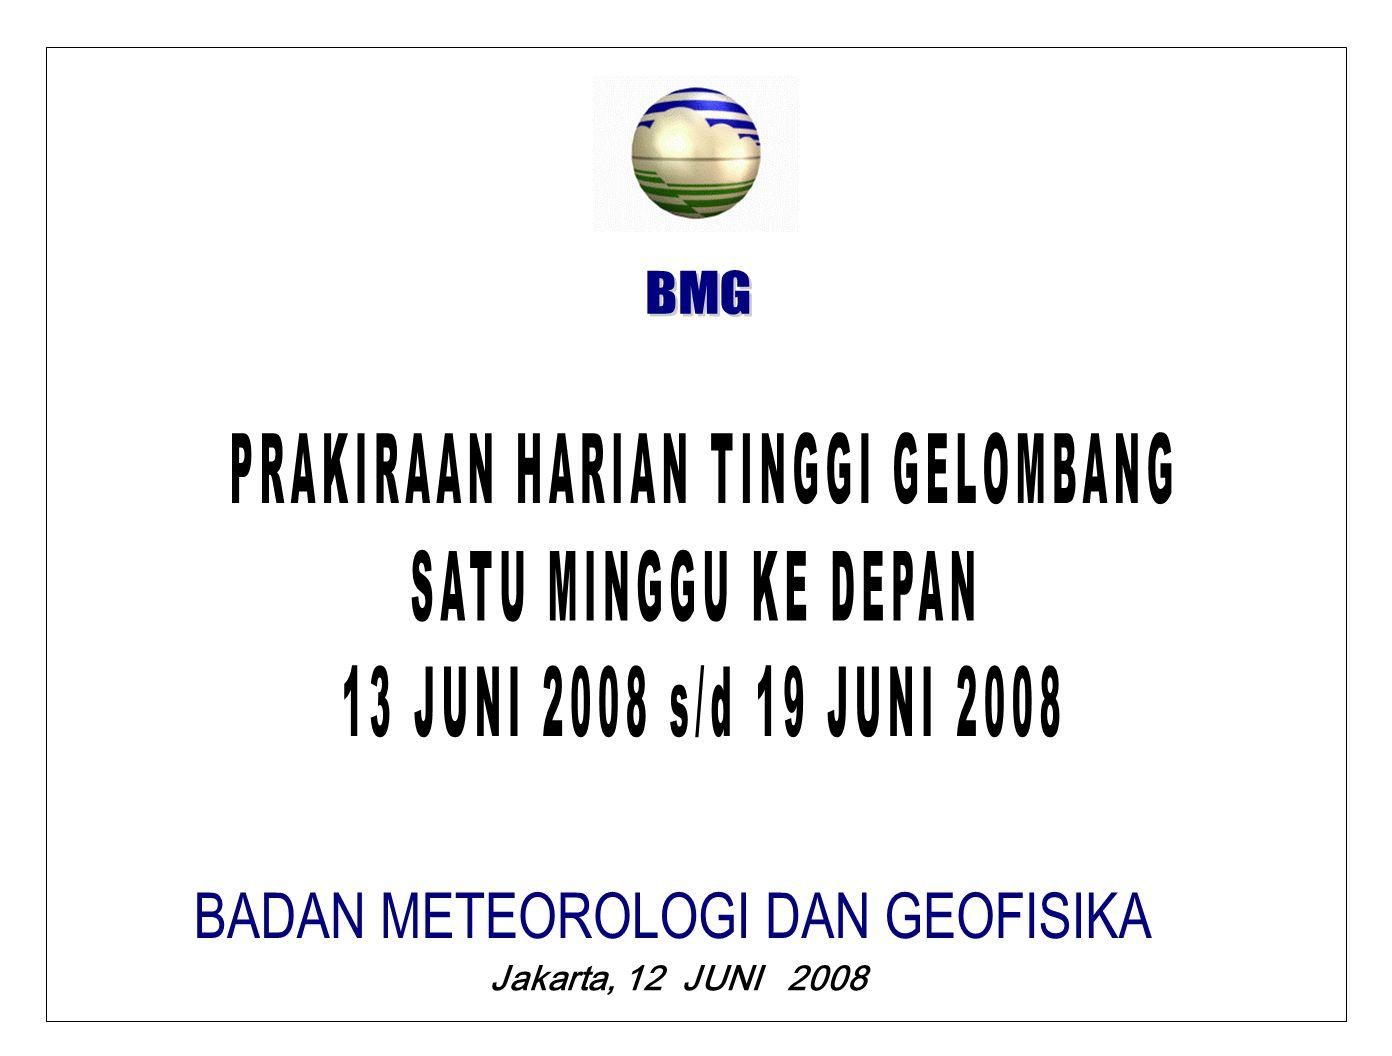 PRAKIRAAN TINGGI GELOMBANG SATU MINGGU KE DEPAN BMG JUMAT, 13 JUNI 2008 GELOMBANG DAPAT TERJADI 2,0 M S/D 2,5 M DI : LAUT CINA SELATAN, SELAT MALAKA BAGIAN BARAT, PERAIRAN ACEH, PERAIRAN MENTAWAI, SAMUDERA HINDIA SELATAN BALI, LAUT FLRES, LAUT SAWU DAN TELUK TOLO.